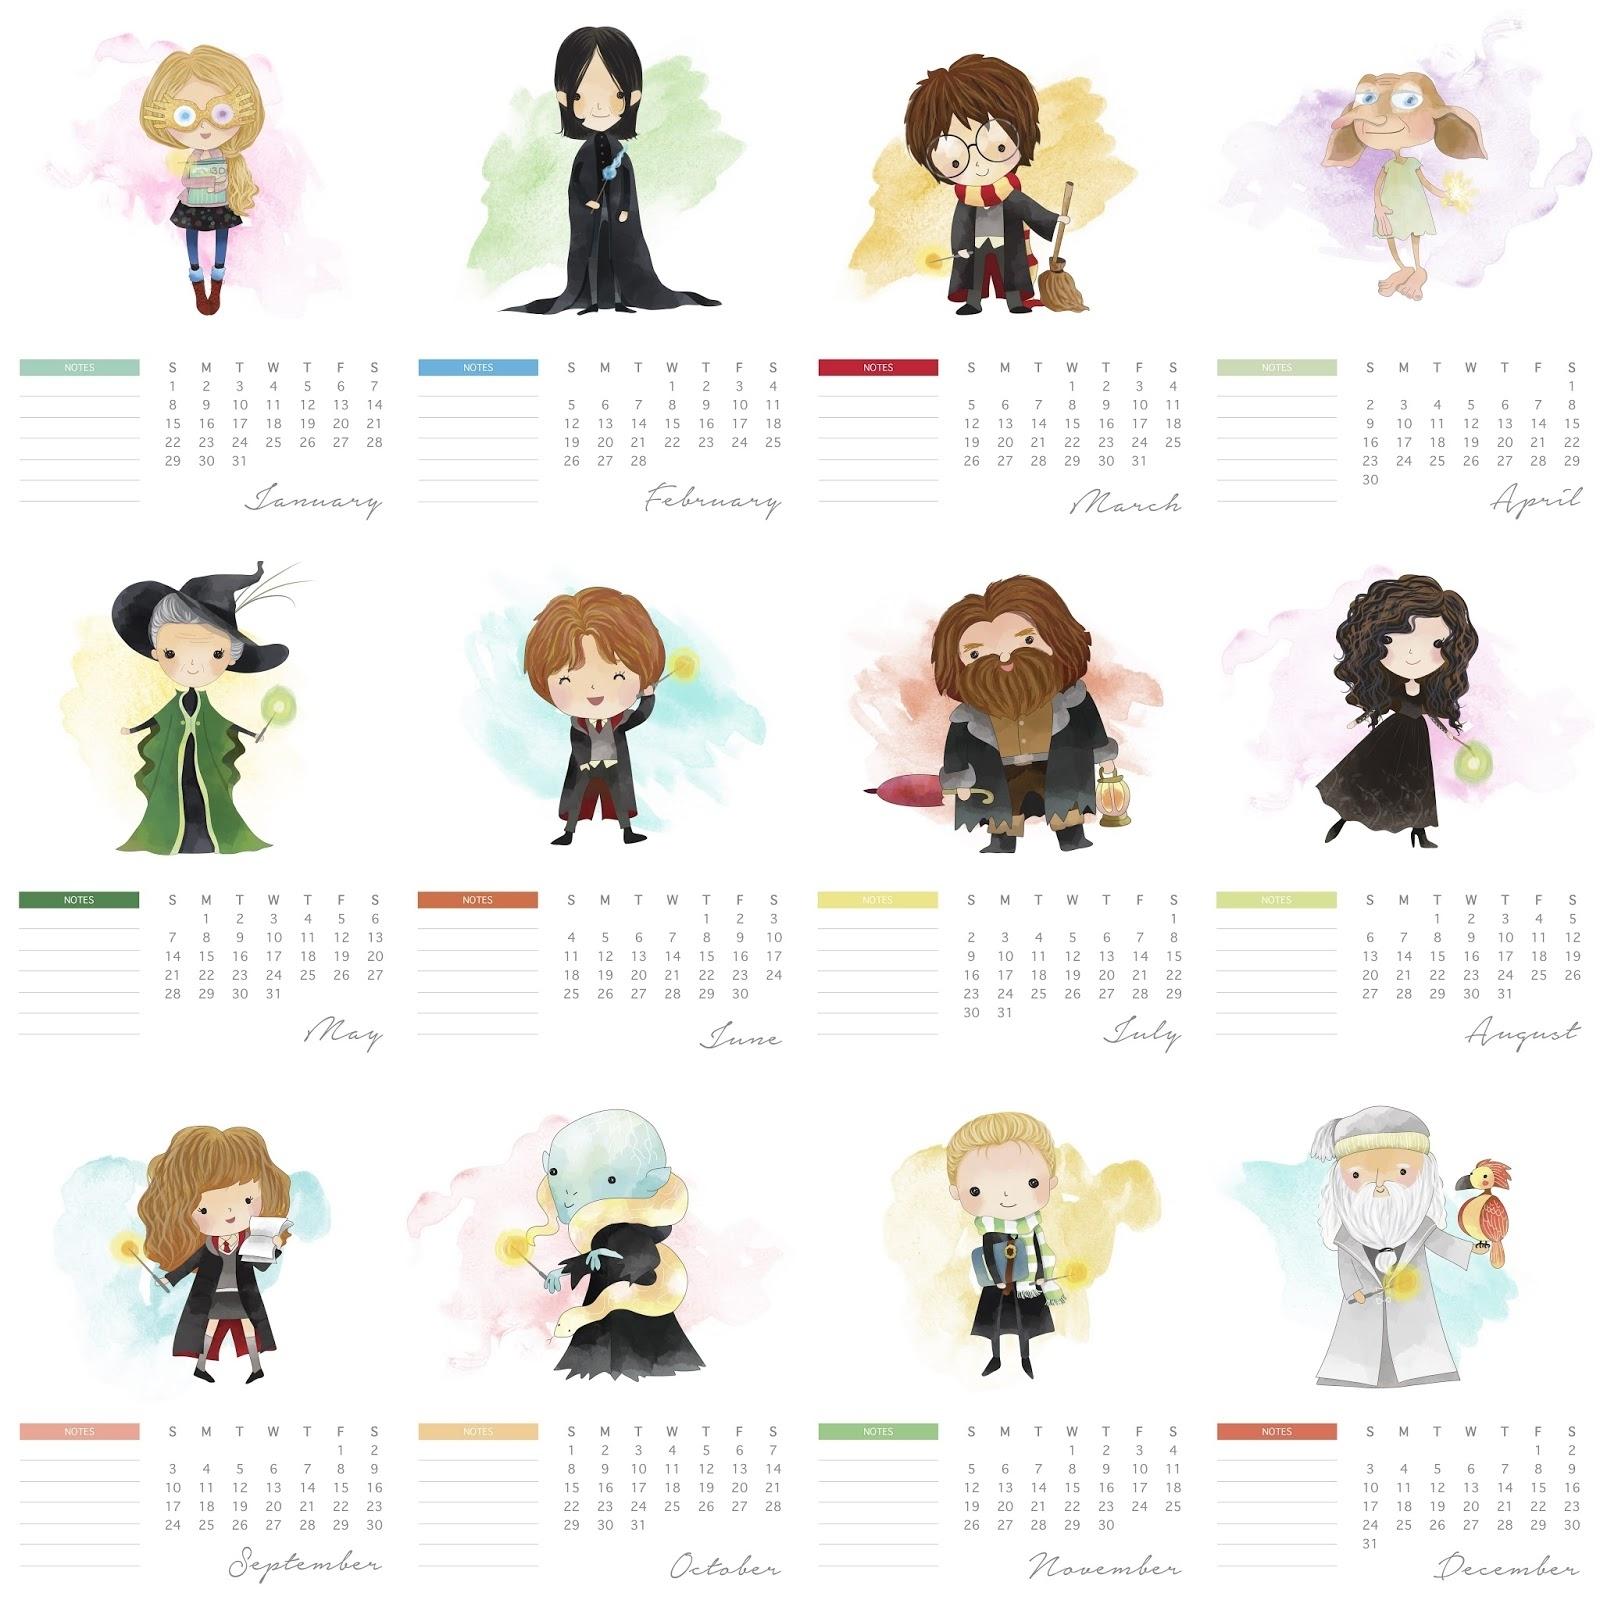 Free Printable 2017 Harry Potter Calendar. - Oh My Fiesta! For Geeks regarding Free Printable Adult Superhero Calendars